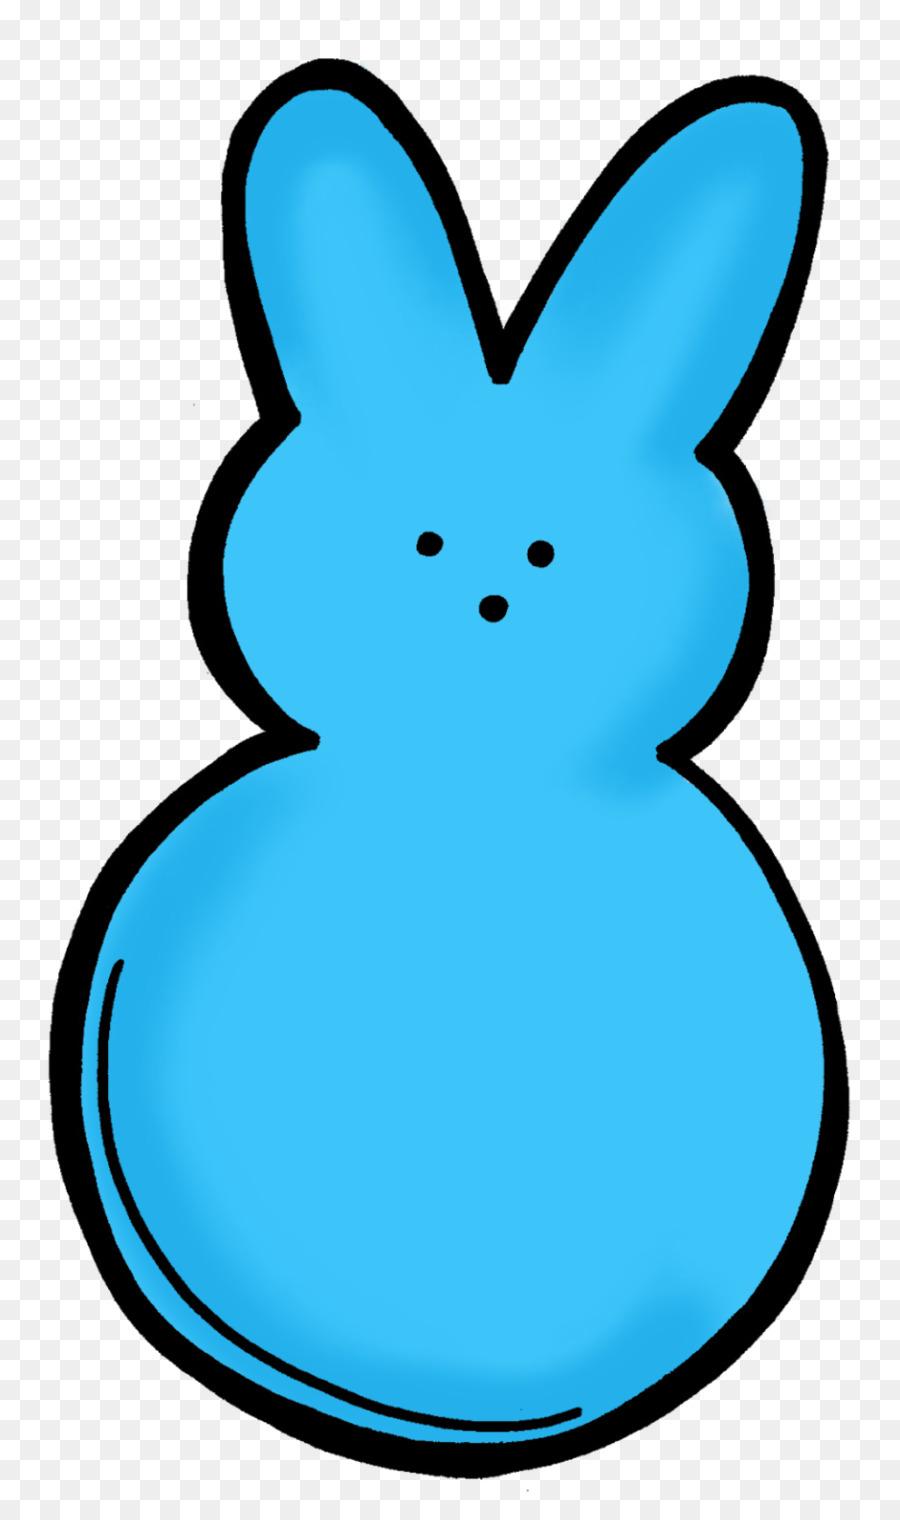 900x1520 Easter Bunny Rabbit Peeps Clip Art